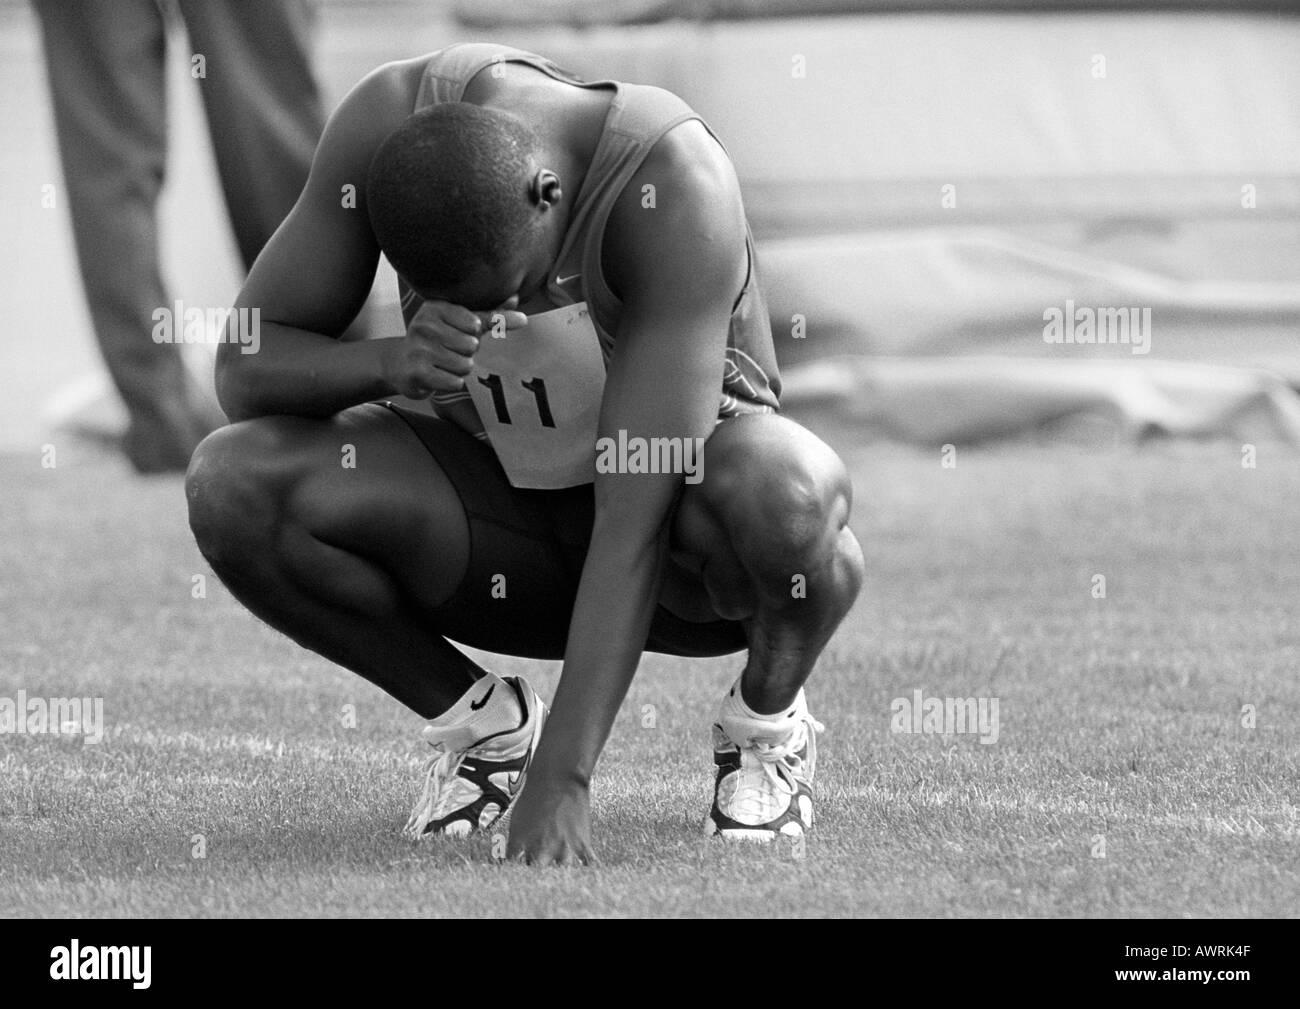 Male athlete crouching, head down, b&w - Stock Image